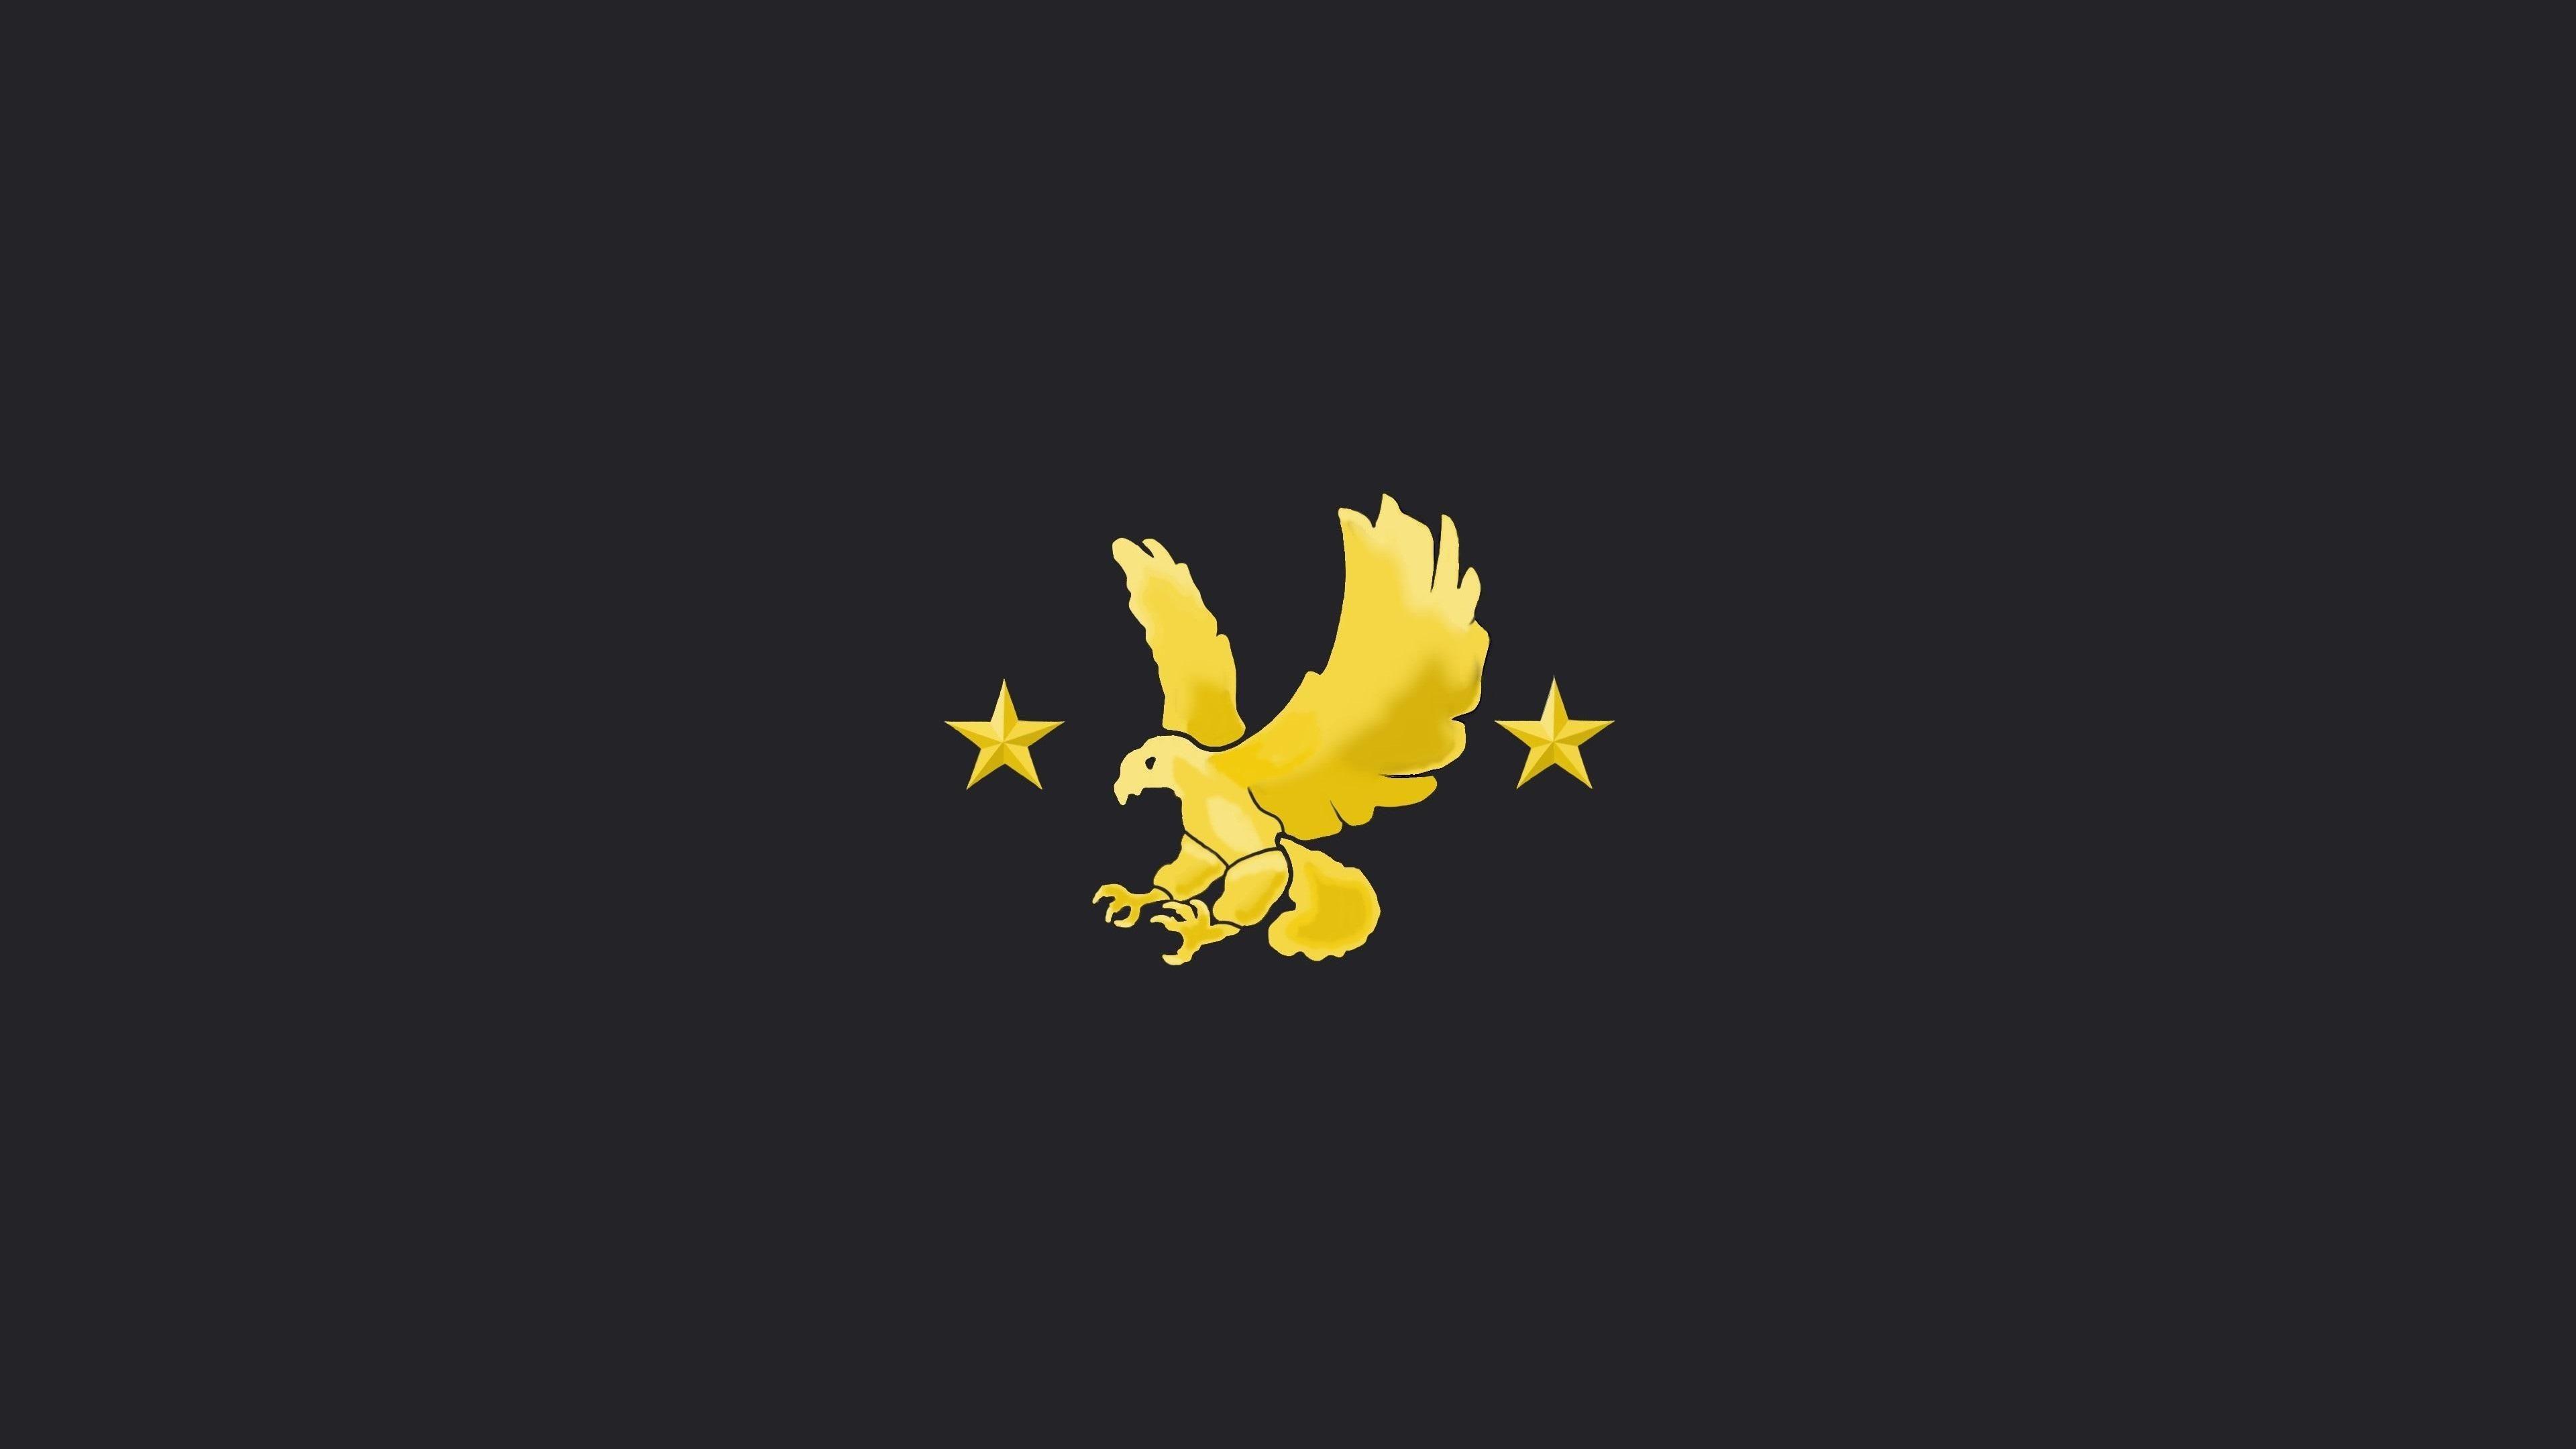 Res: 3840x2160, Legendary Eagle 4K Wallpaper #games #globaloffensive #CSGO #counterstrike  #hltv #CS